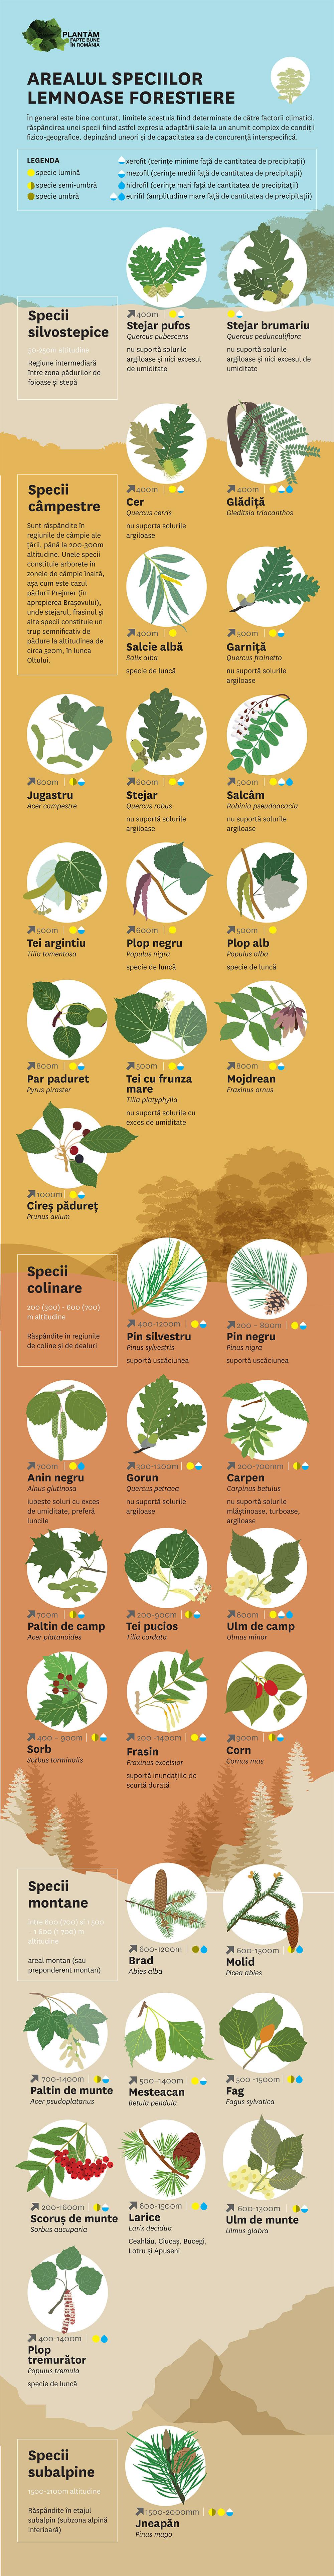 infografic-specii-silvostepice-1